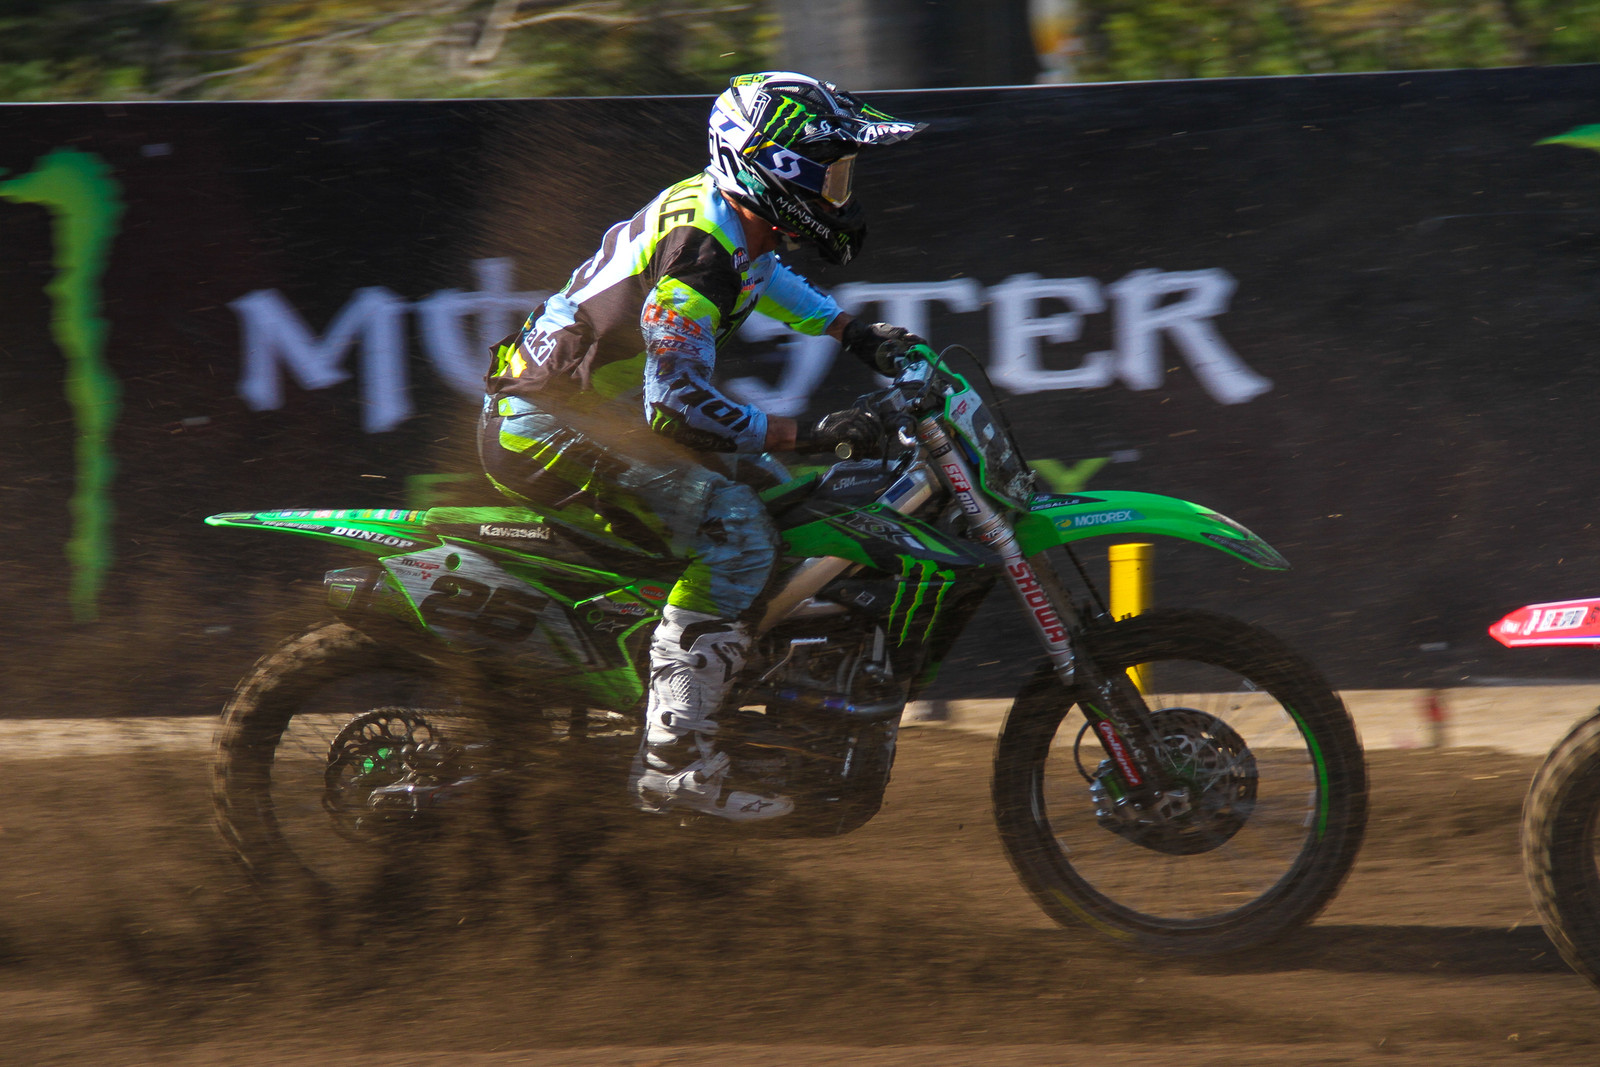 Clement Desalle - Photo Blast: 2017 MXGP of Argentina - Motocross Pictures - Vital MX